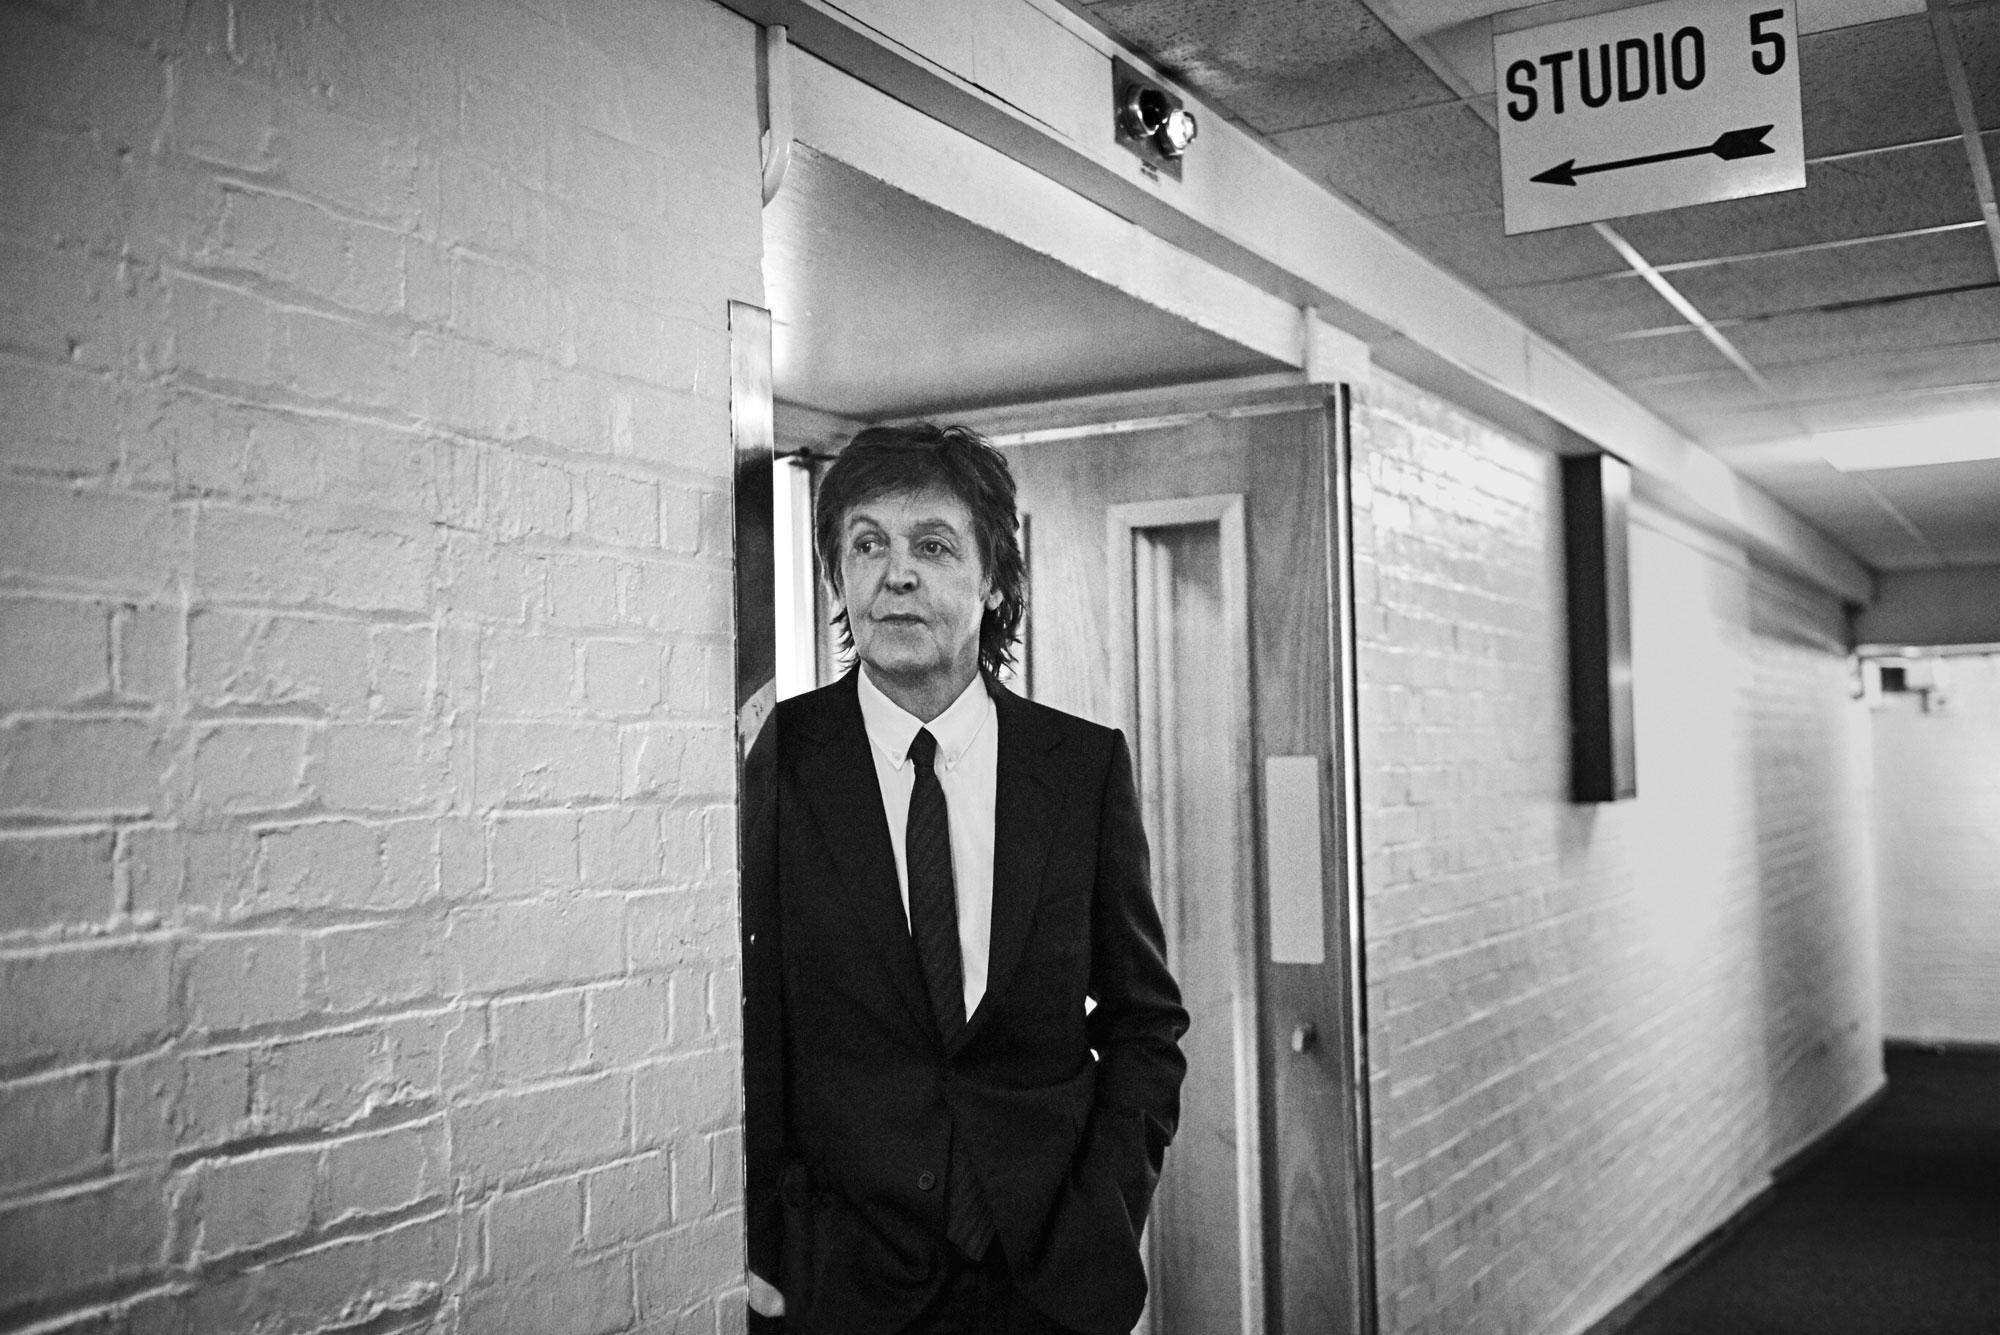 Sir Paul McCartney at BBC Maida Vale Studios